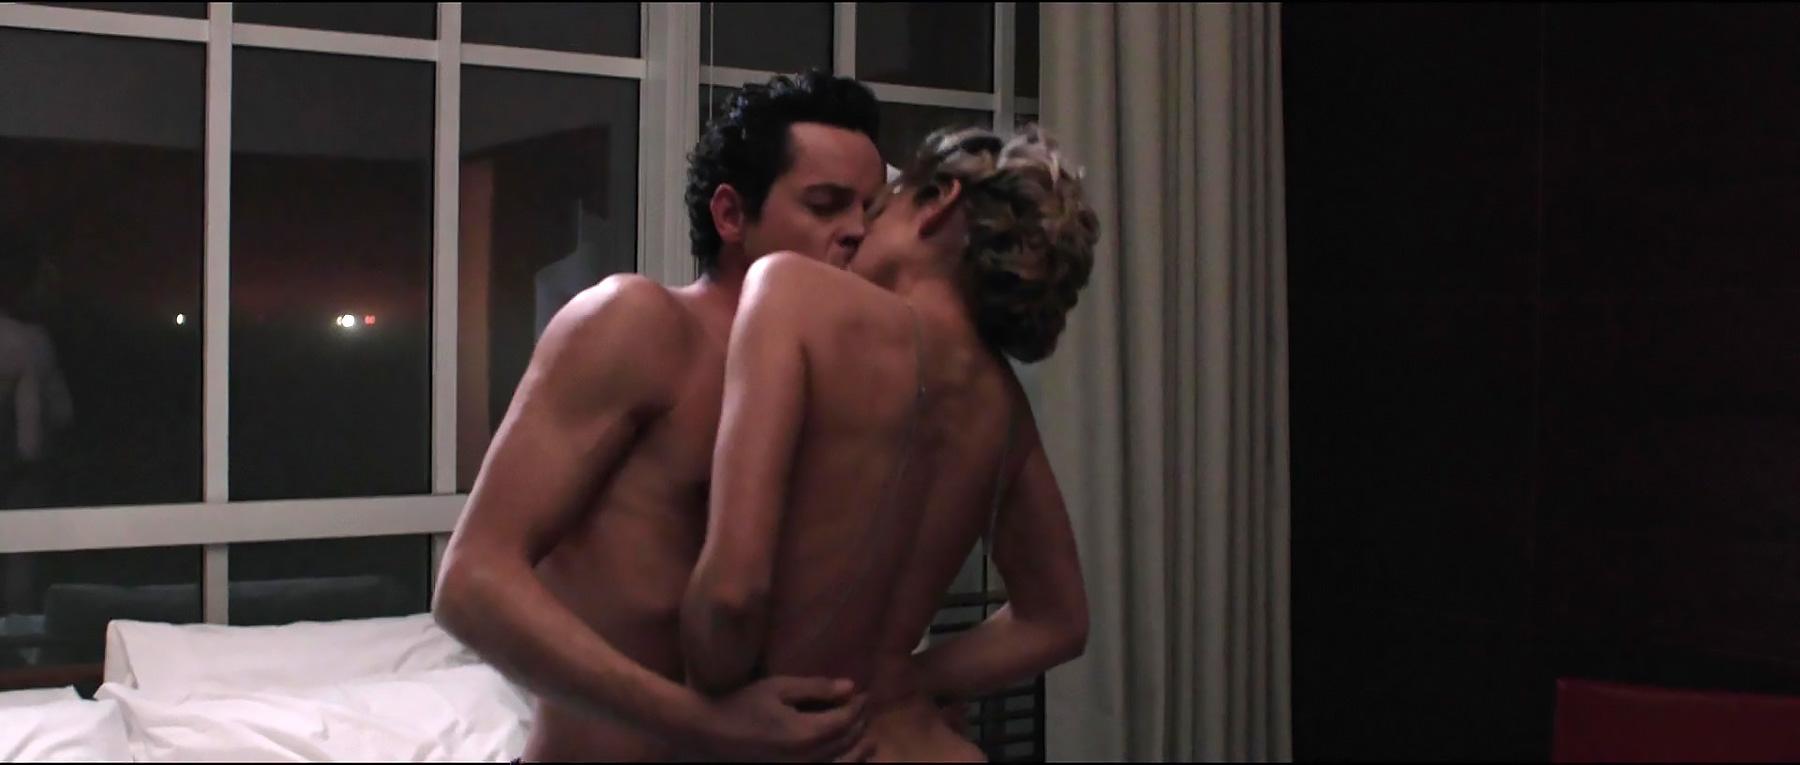 Analeigh Tipton Sex analeigh tipton nude choking sex scene in compulsion